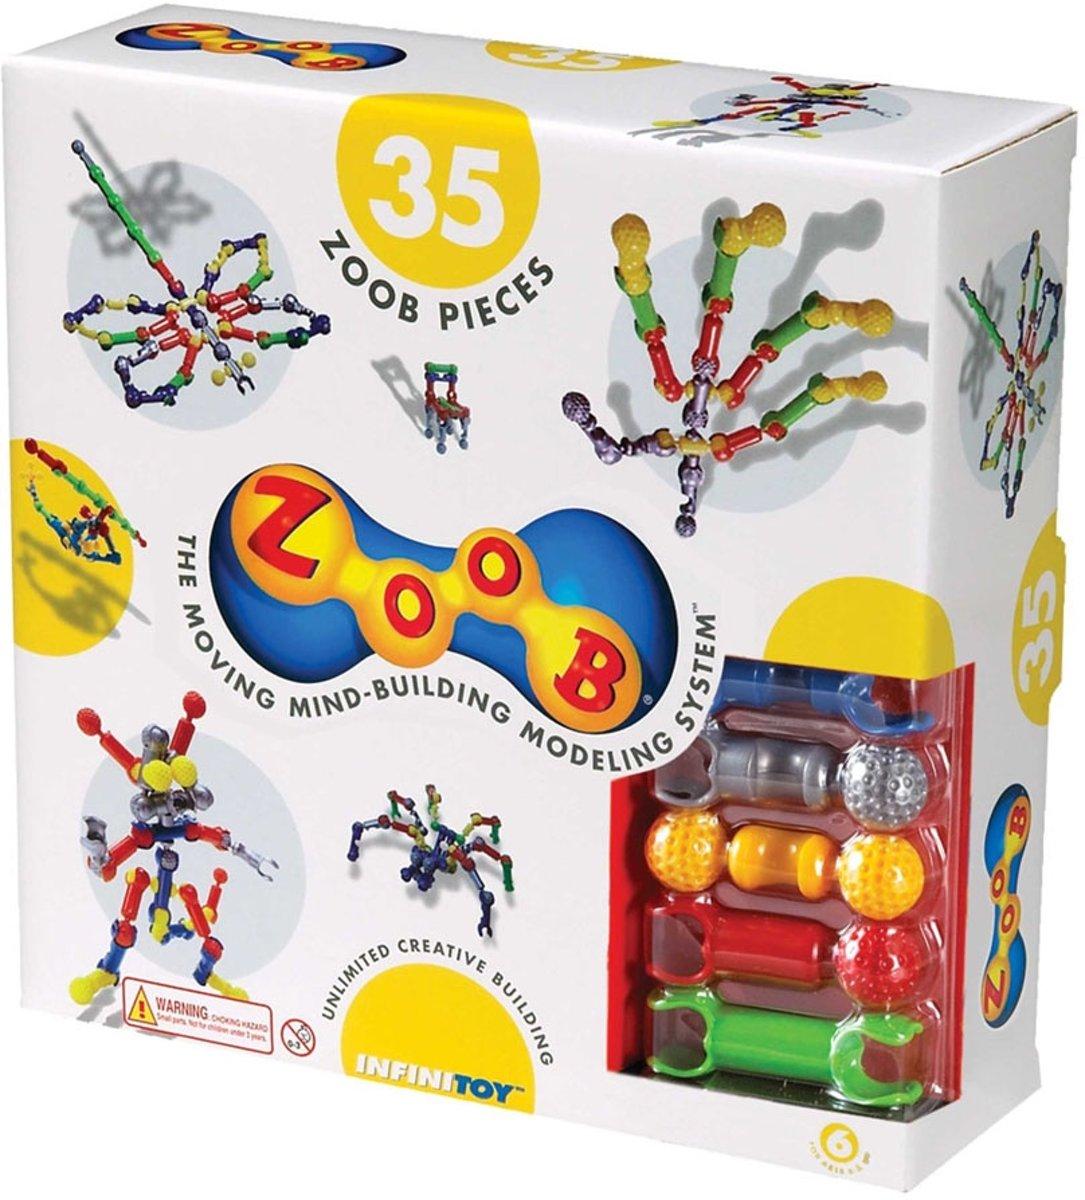 Zoub - 35 pieces